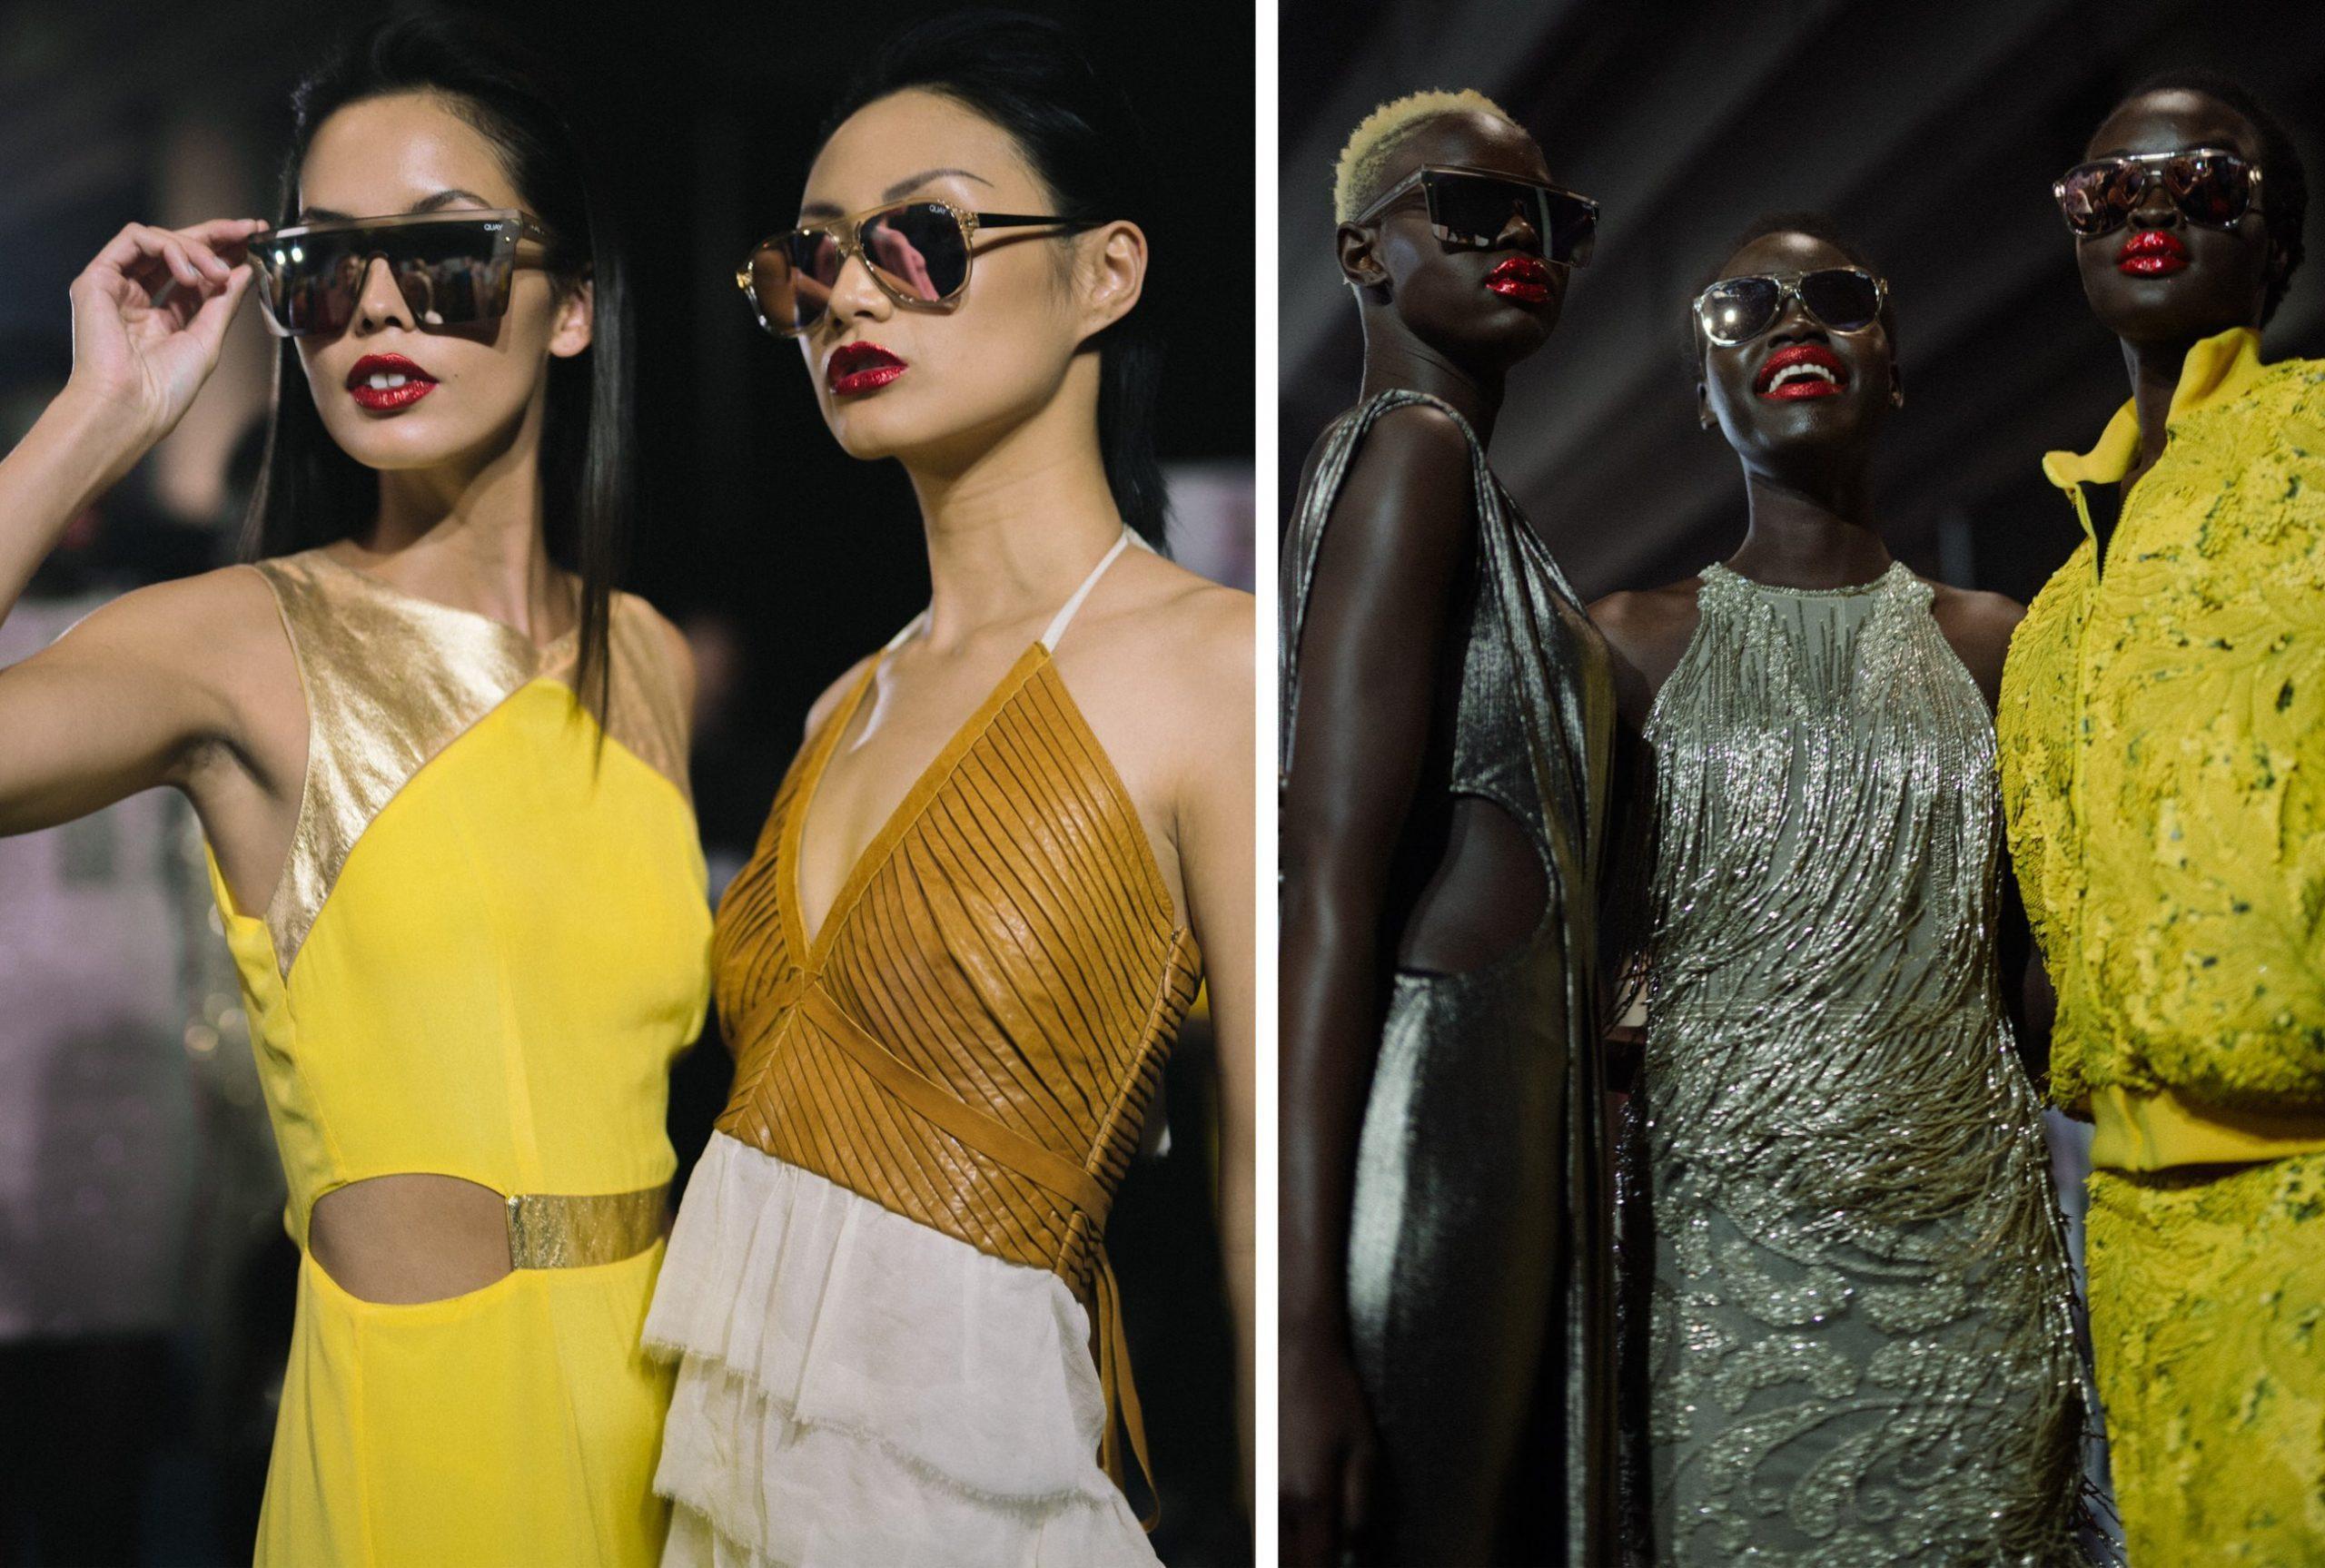 Celebrating 20 Years of Fashion: Backstage at Telstra Perth Fashion Festival's closing night